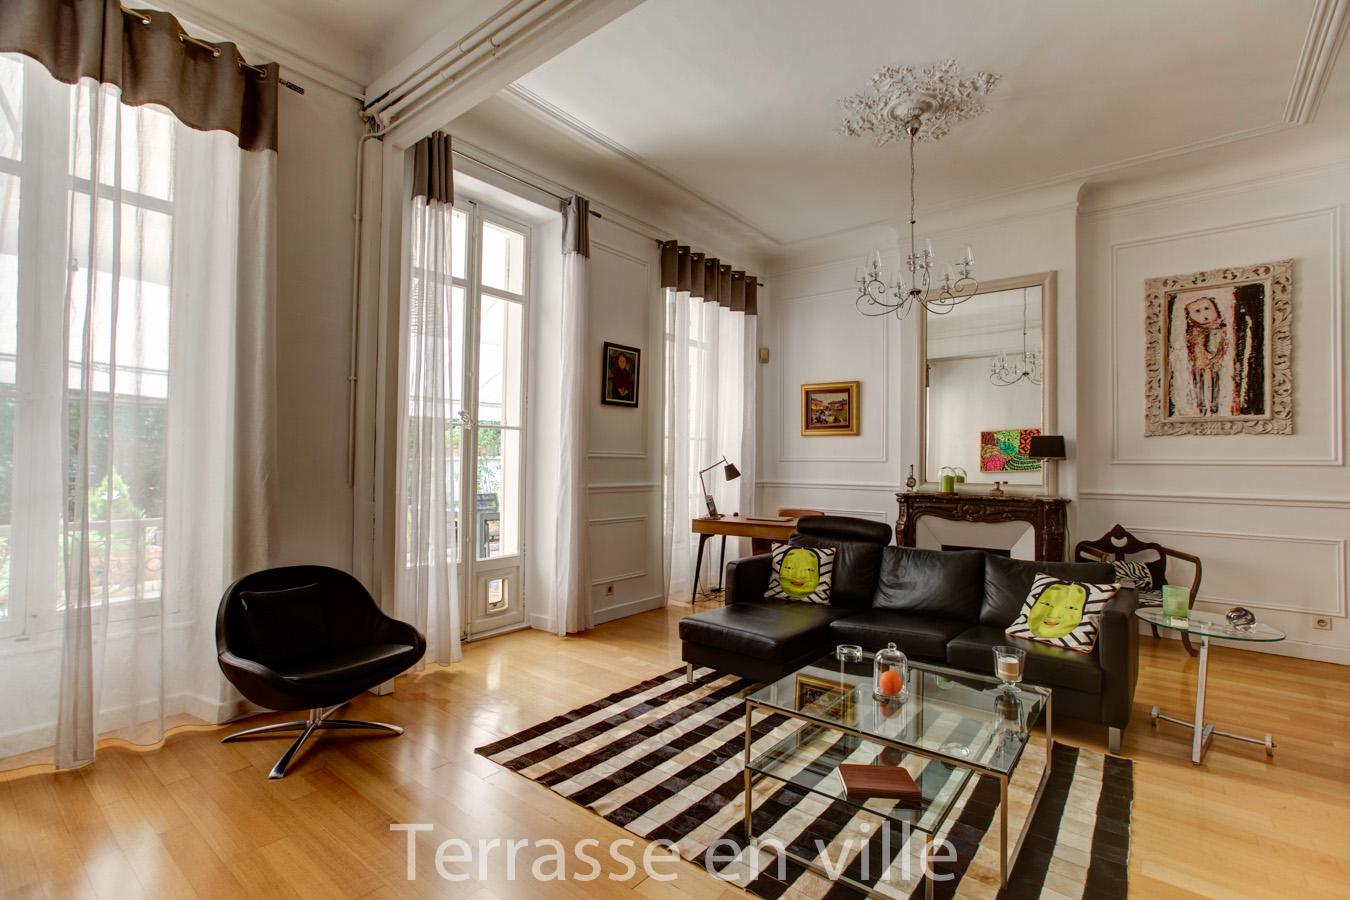 terrasse-9-1.jpg